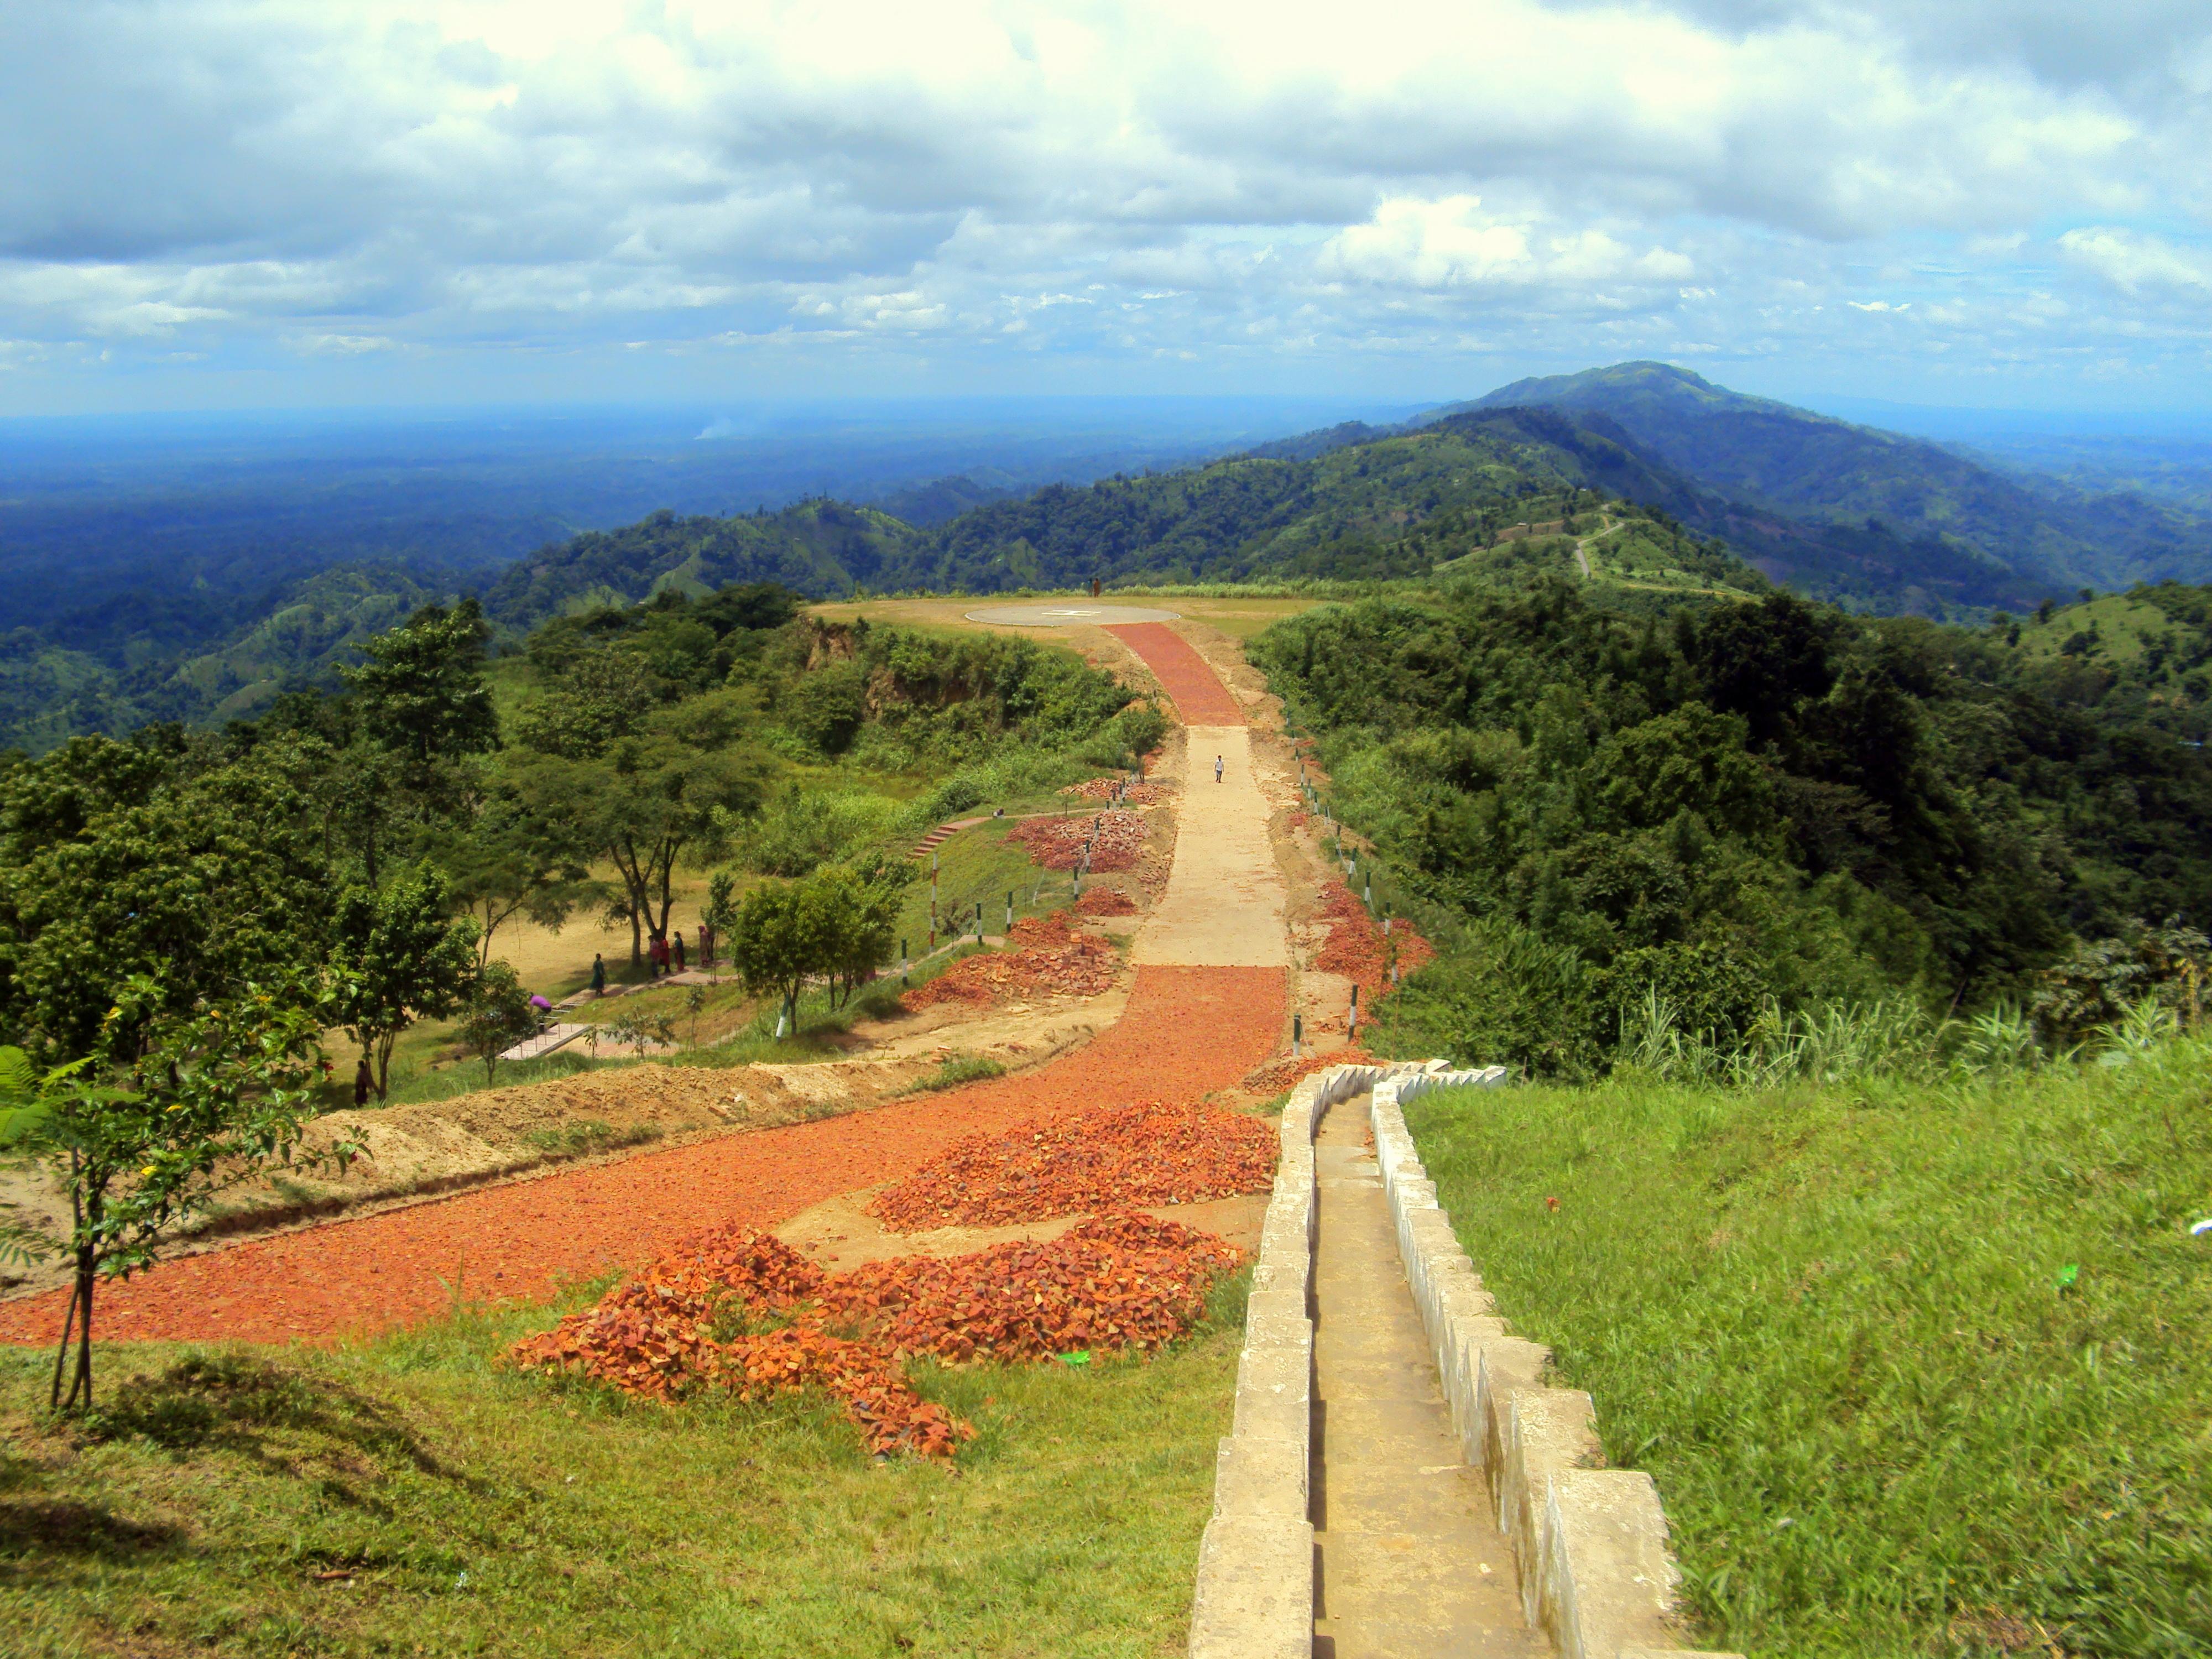 File:Nilgiri, Bandarban.JPG - Wikimedia Commons